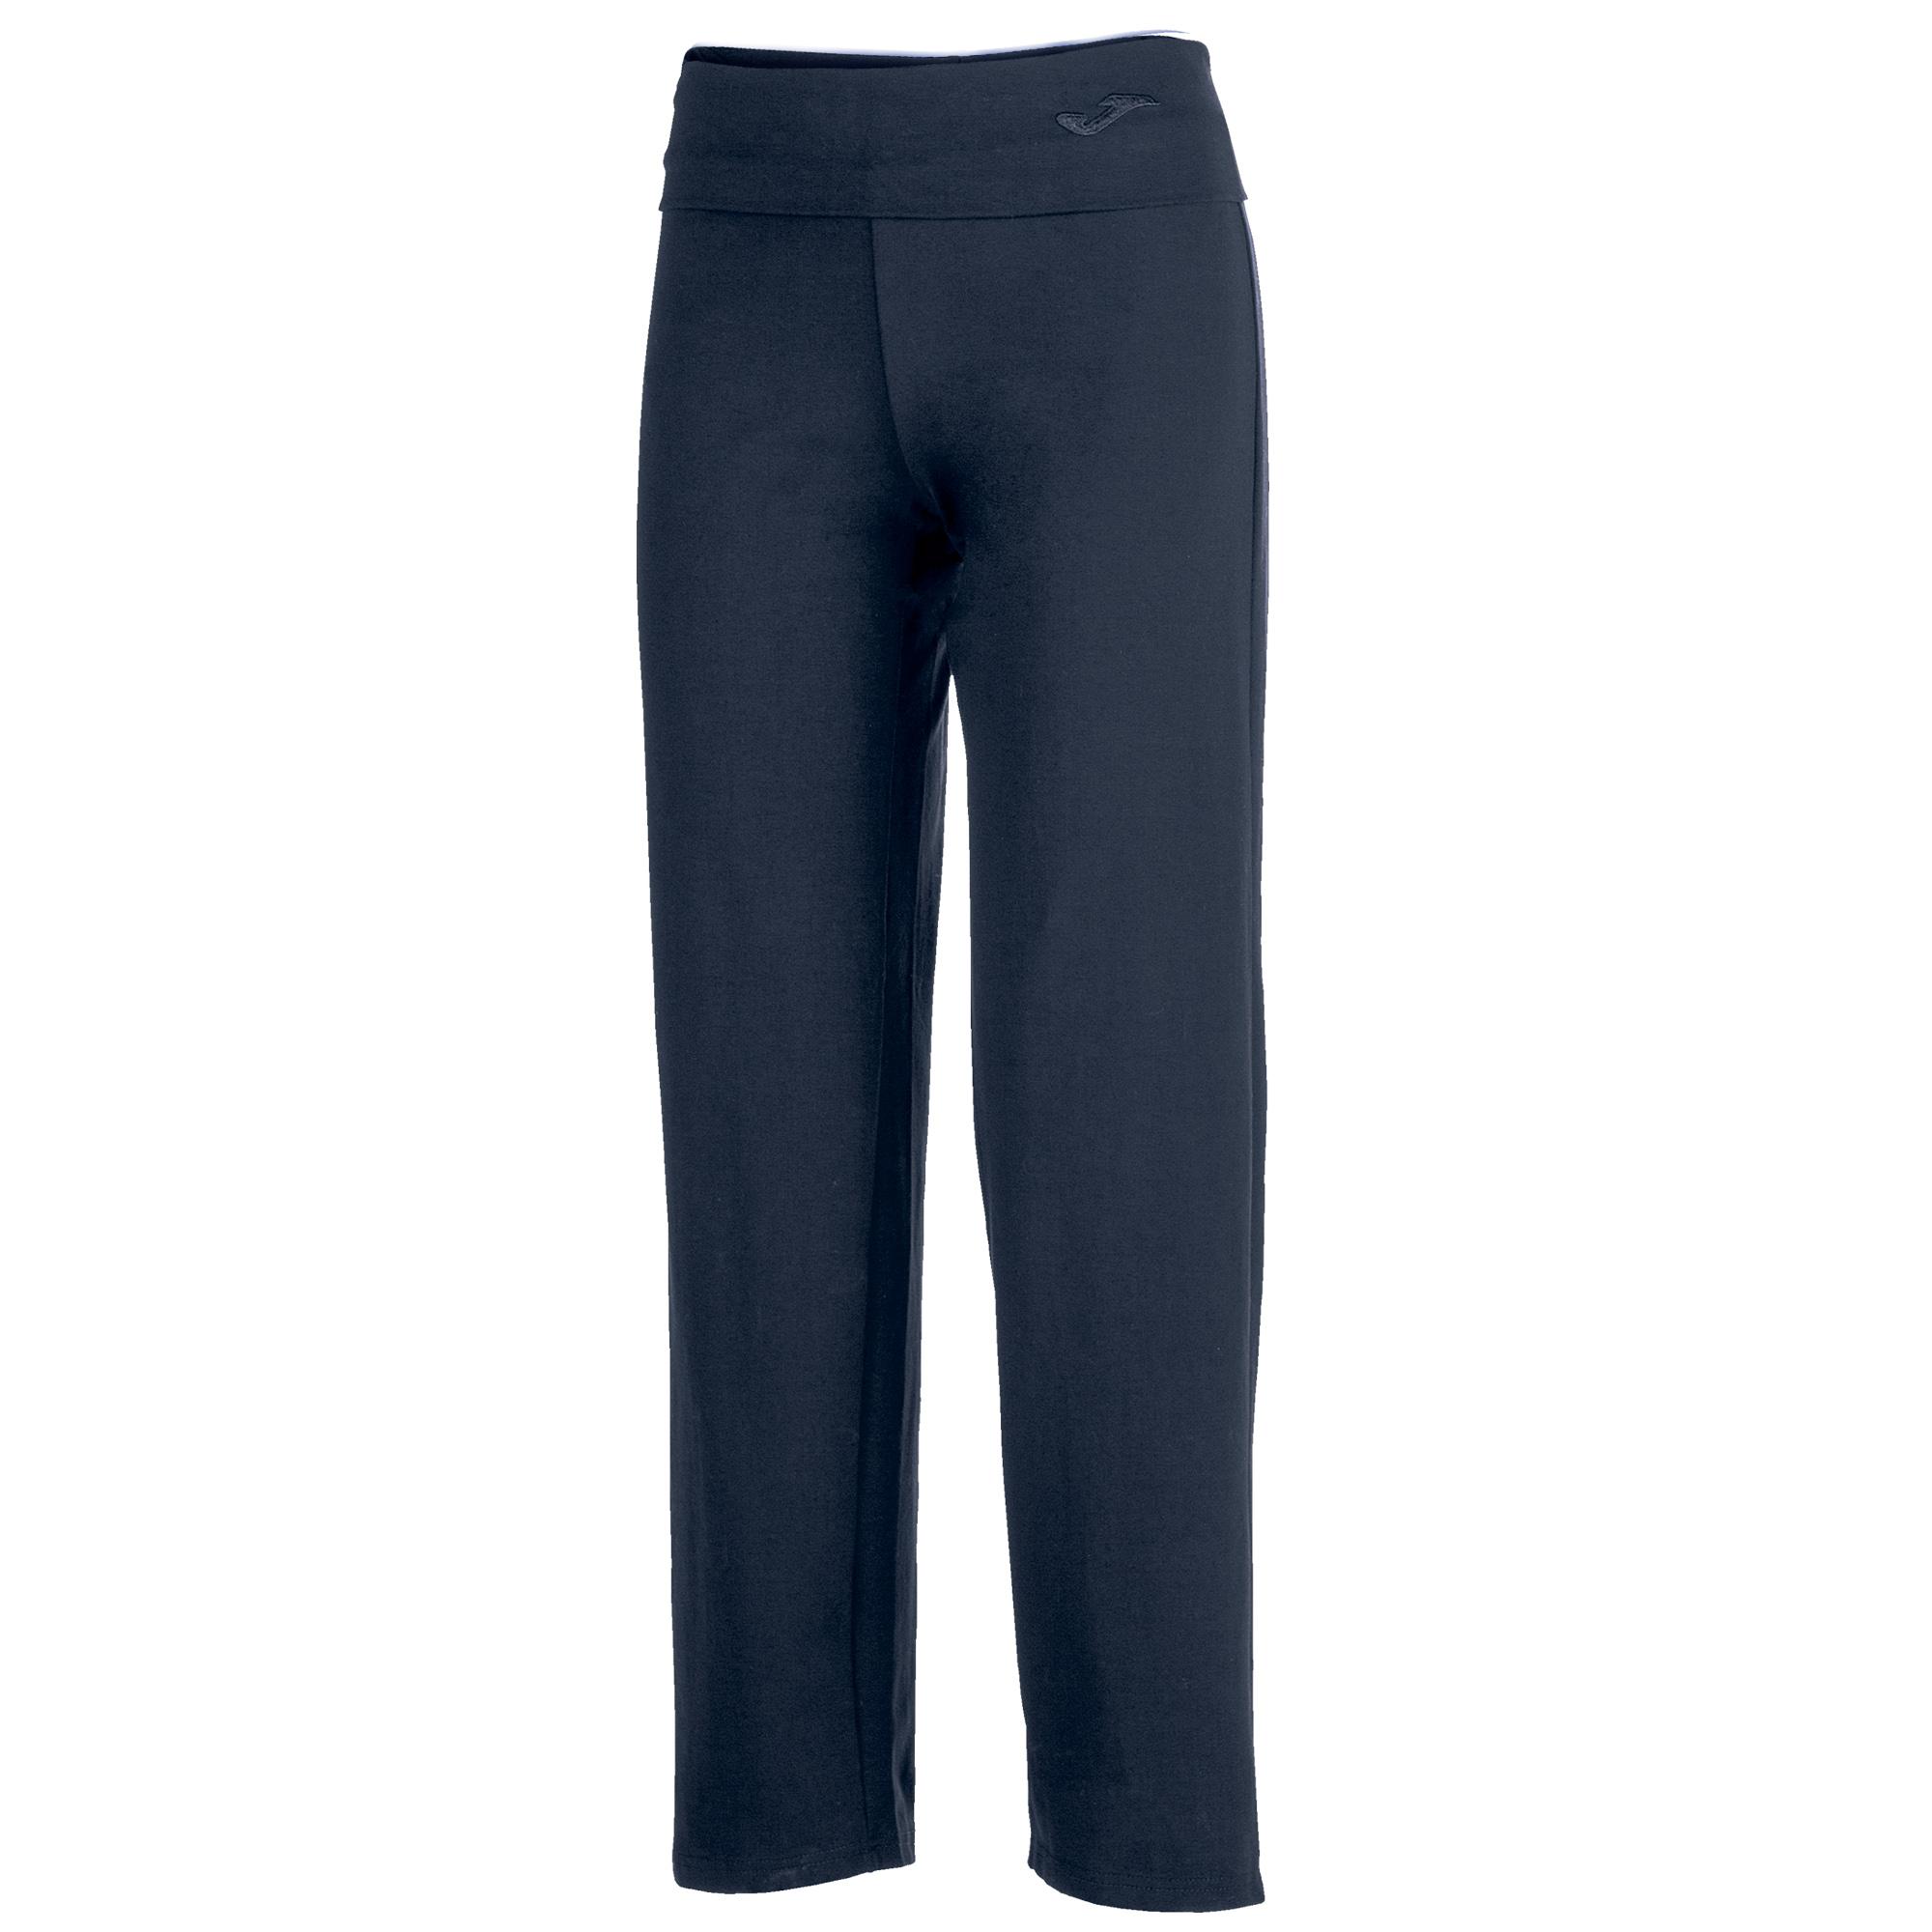 combi cotton pantalon bleu marine femme joma. Black Bedroom Furniture Sets. Home Design Ideas